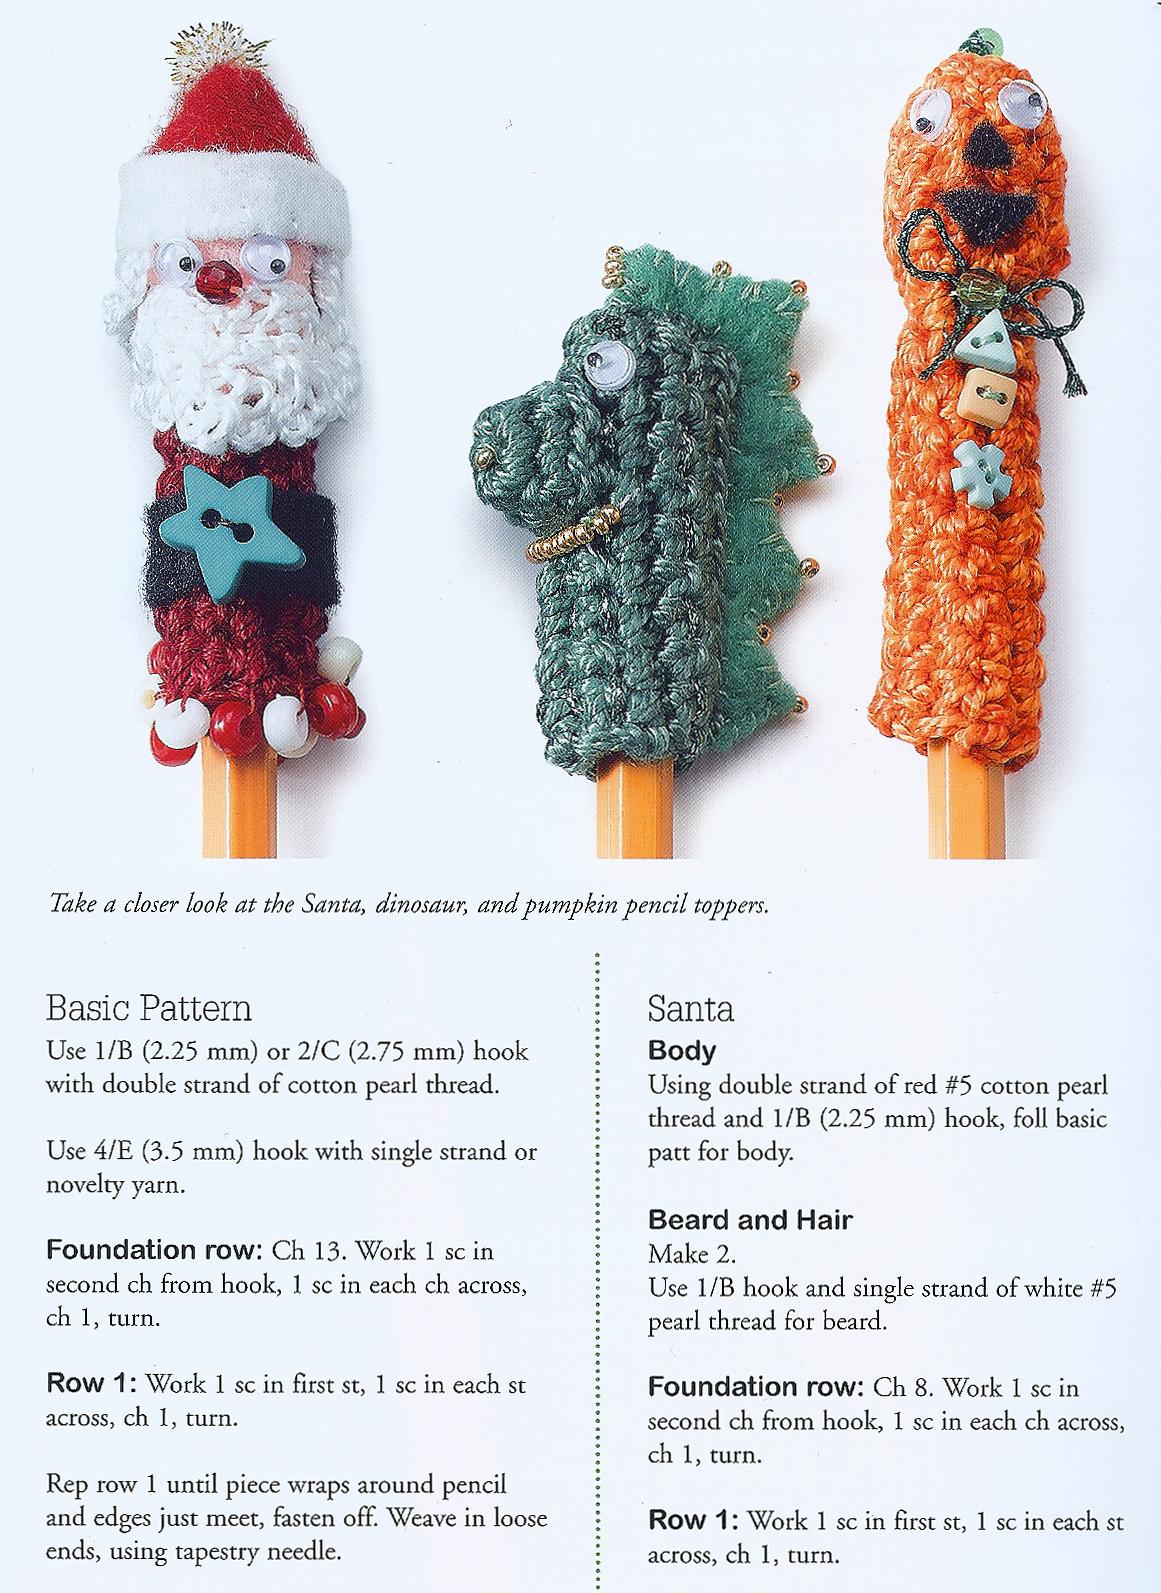 Craftside: Free Crochet Santa Pencil topper pattern from Crochet Kid ...